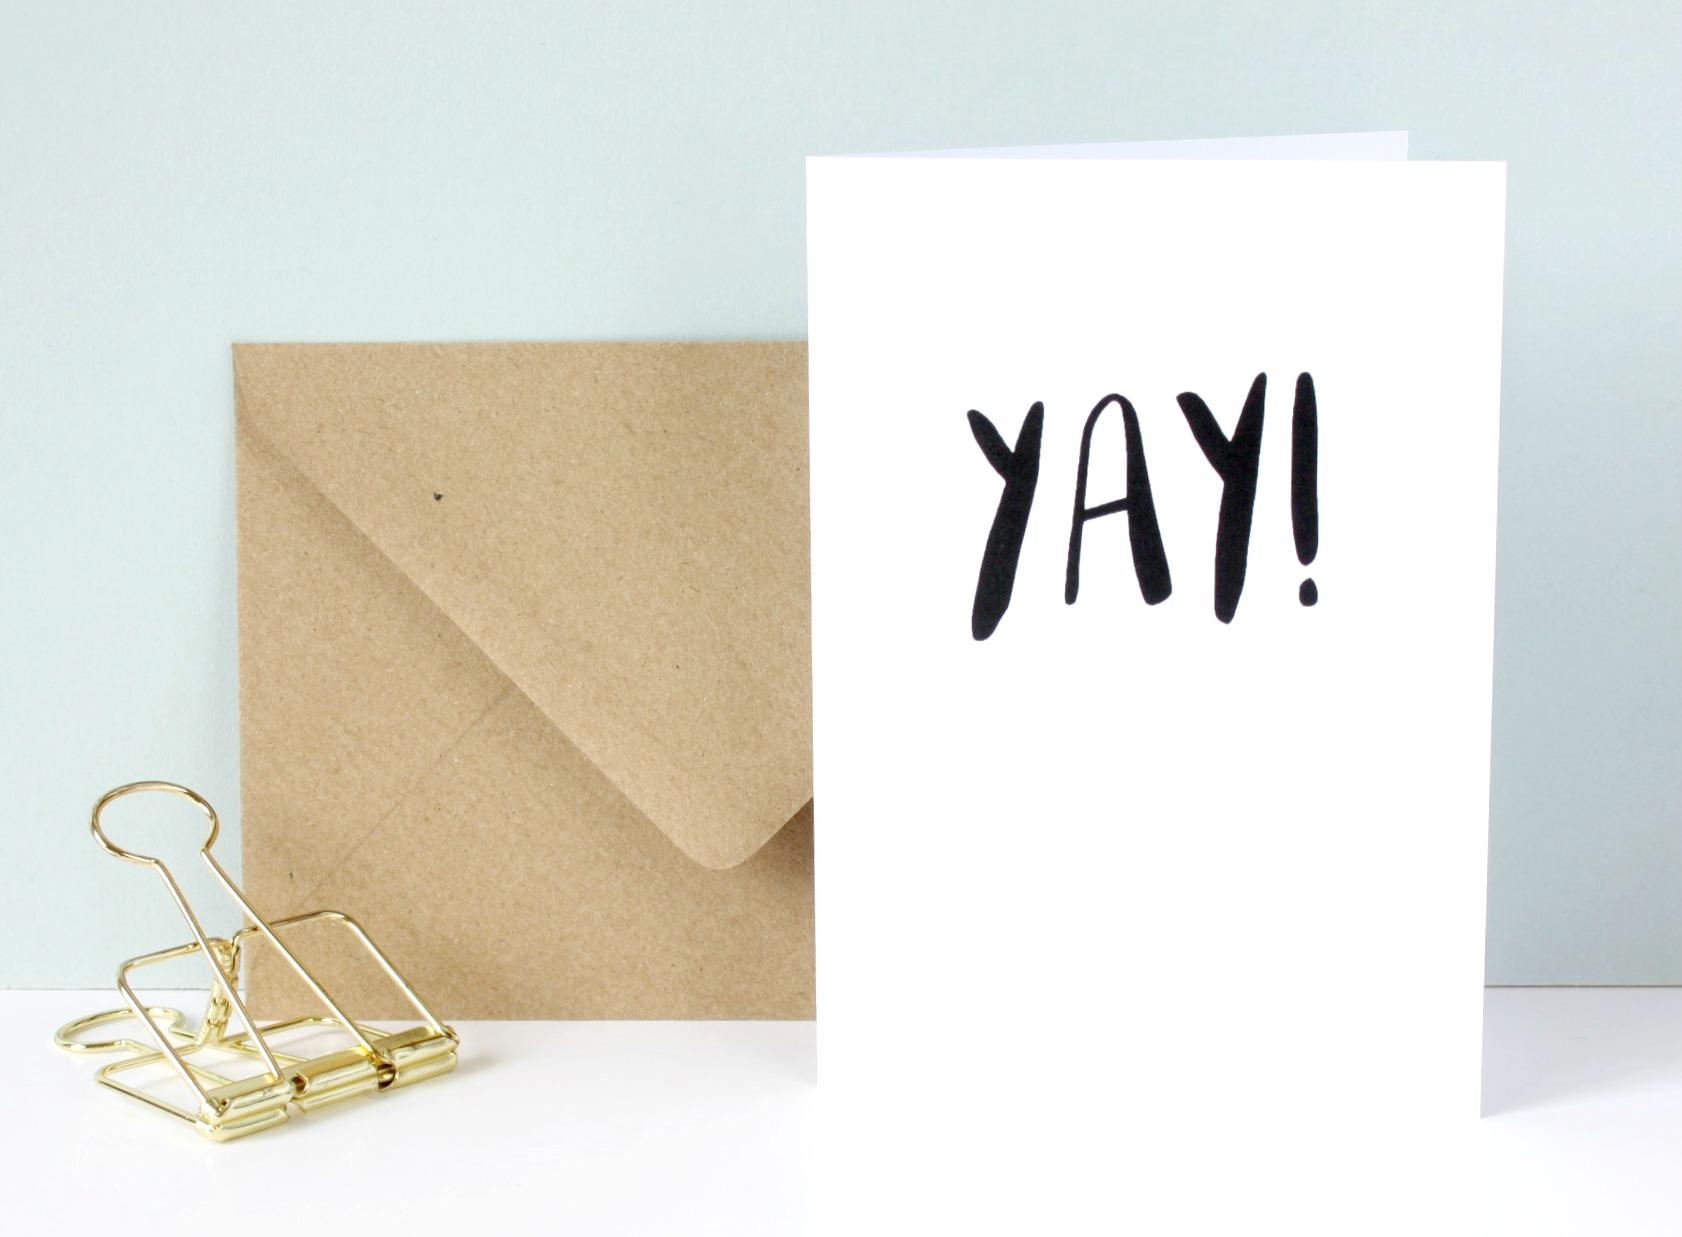 yay! greetings card